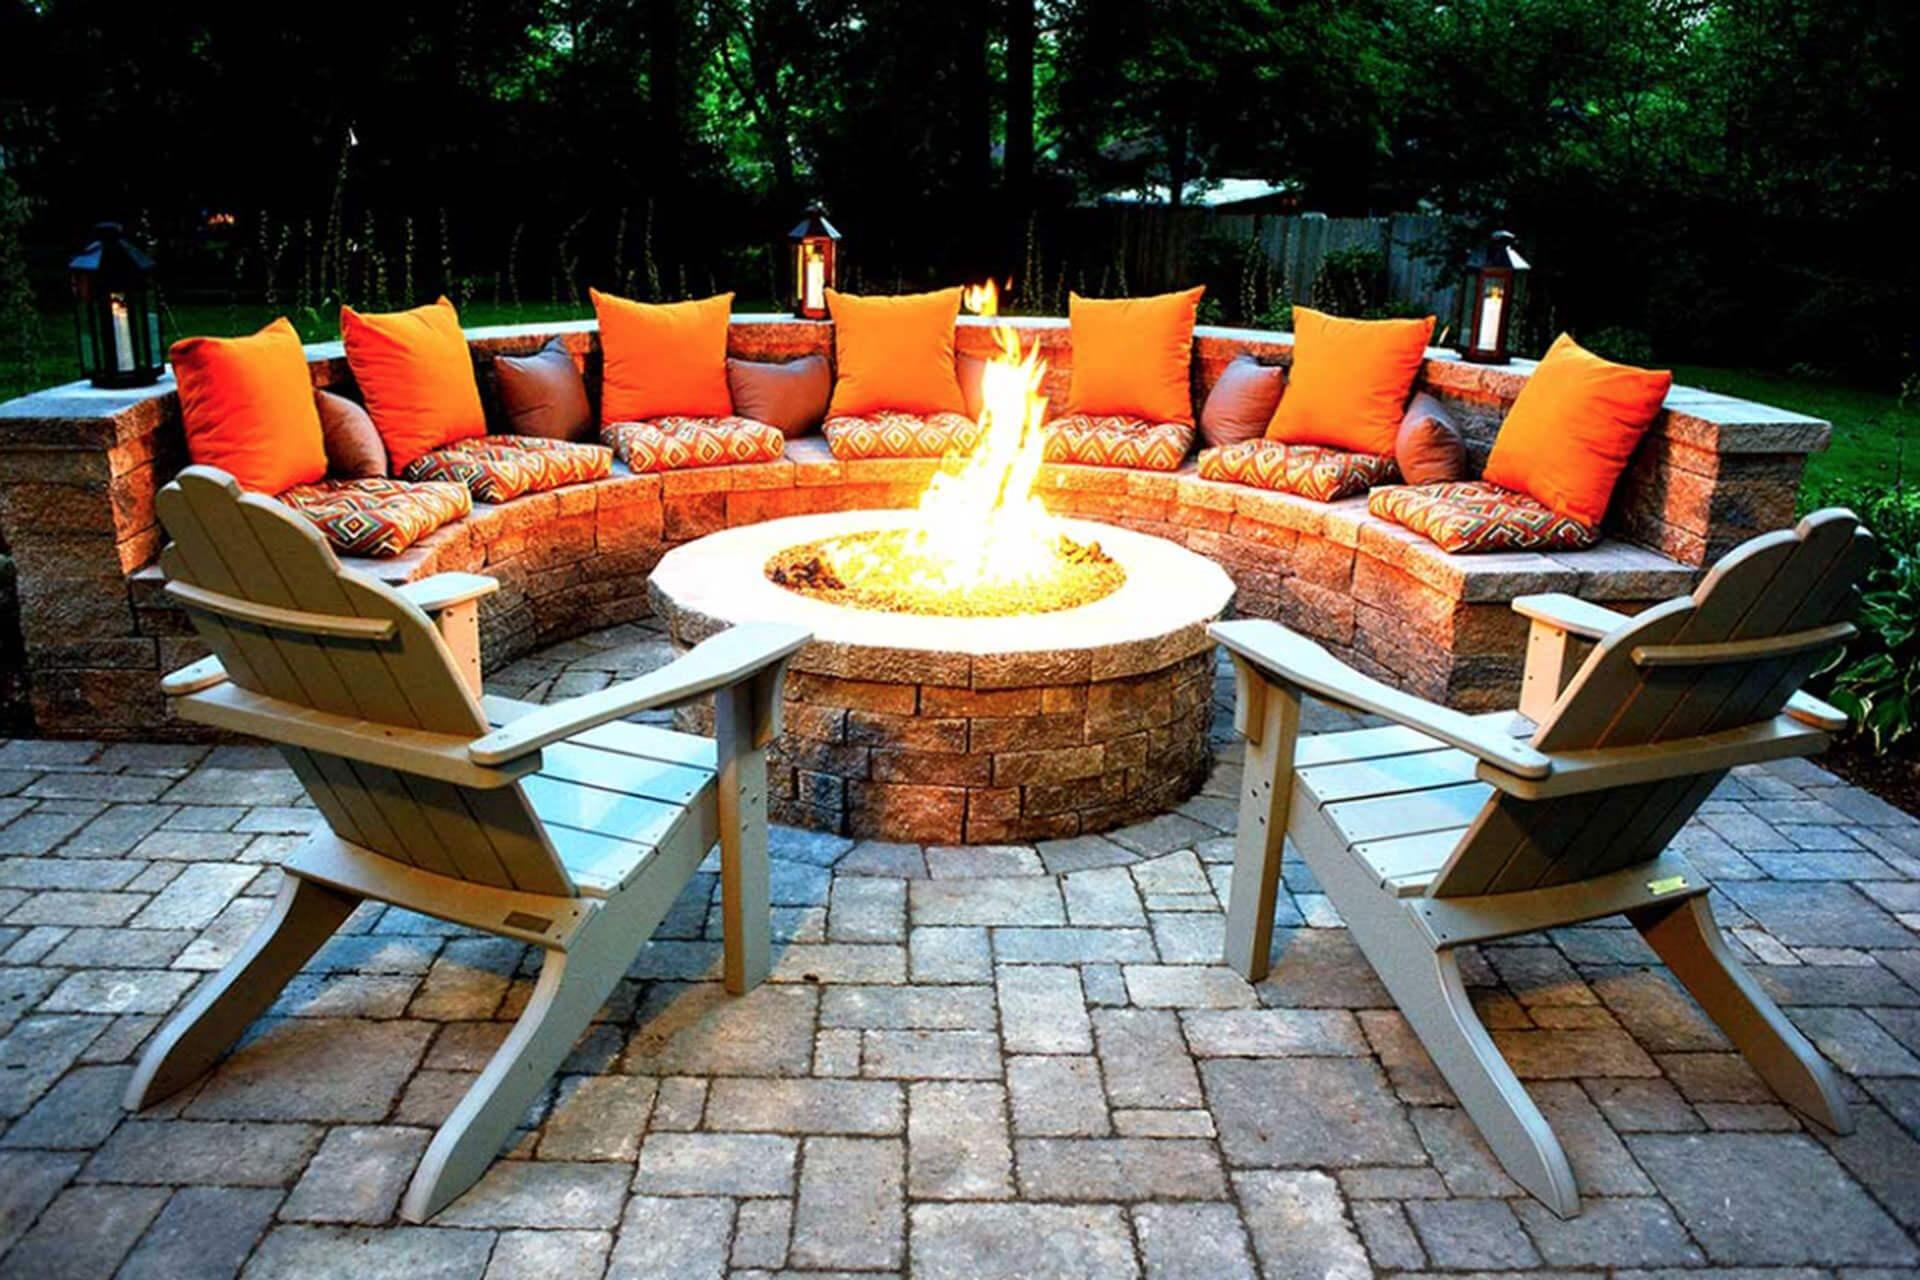 Orange Glowing Round Firepit Area Idea